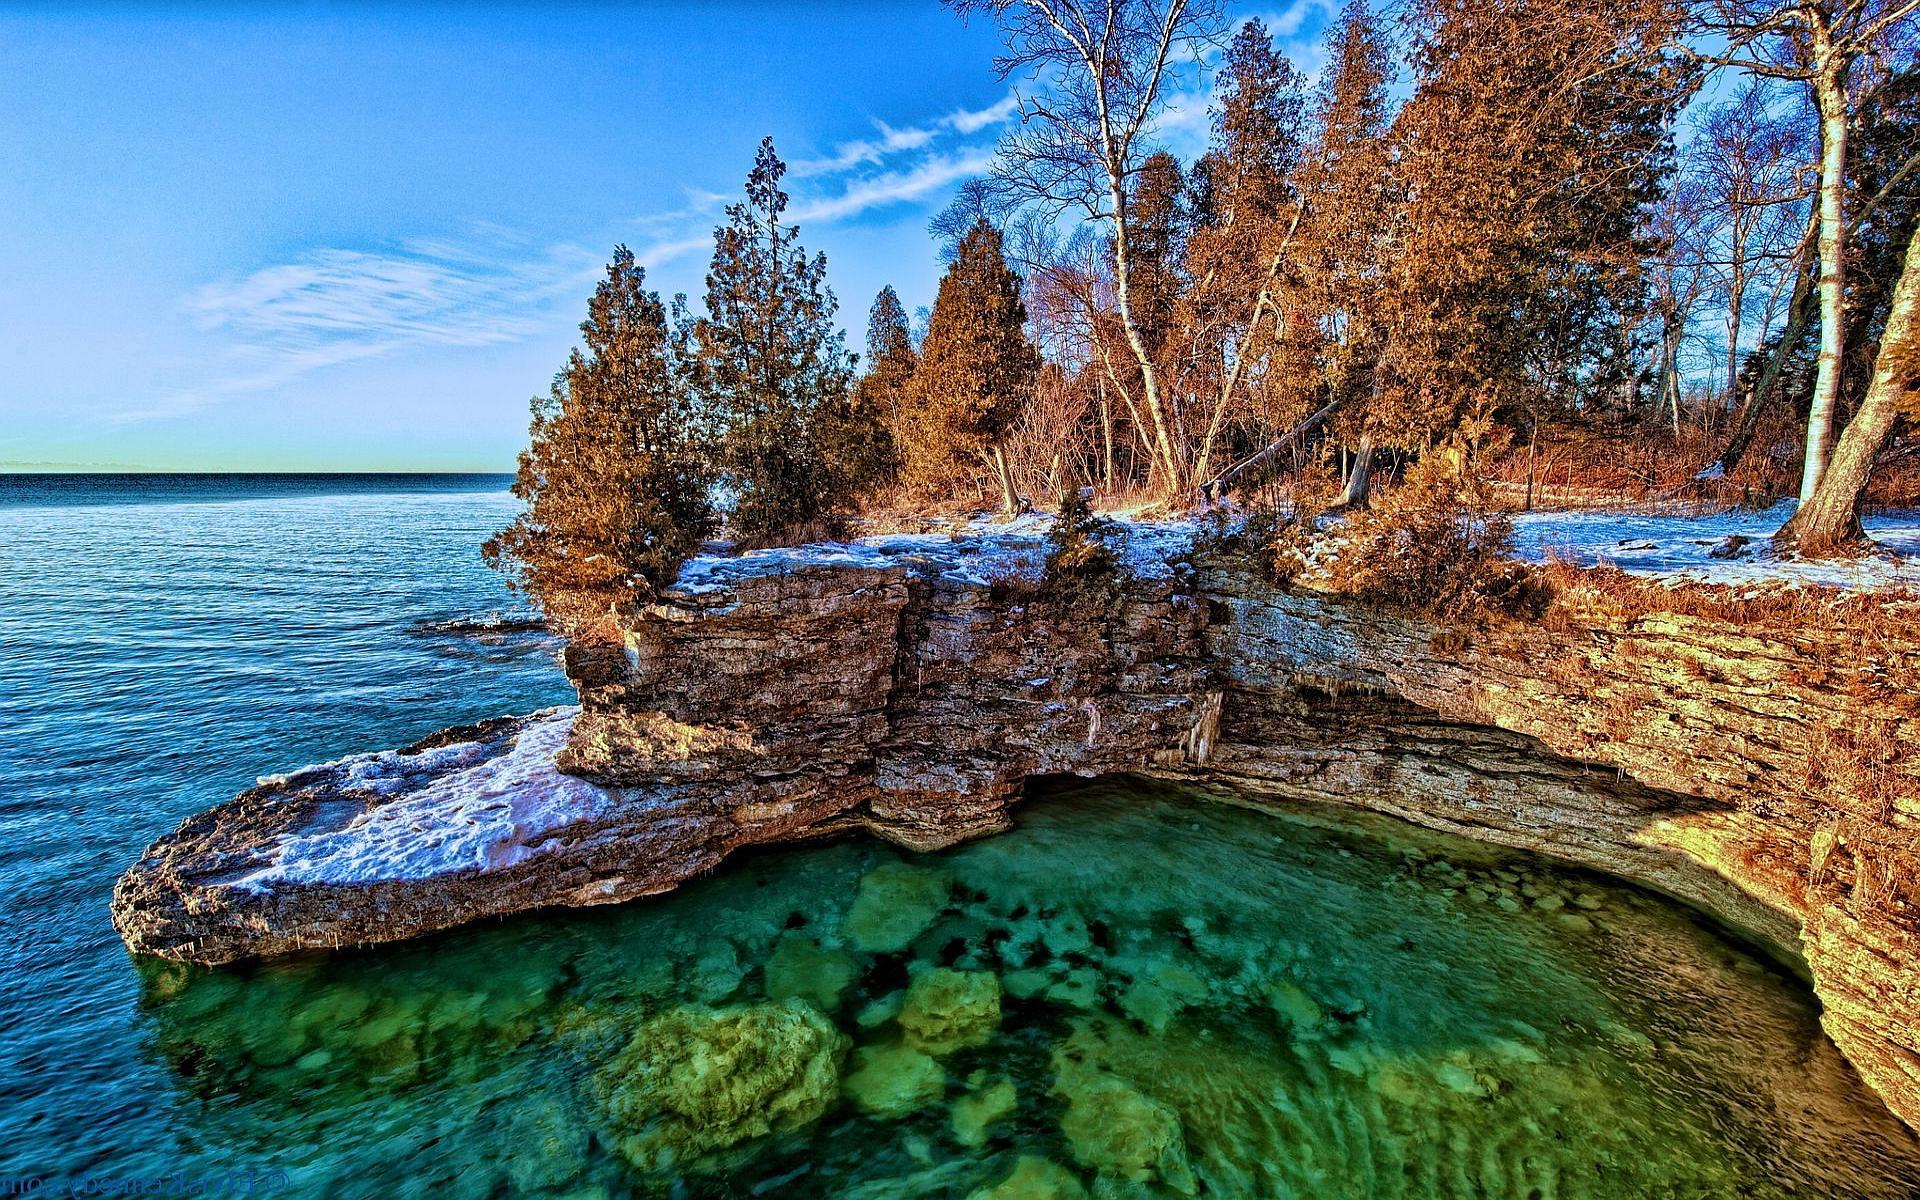 lake wallpaper michigan